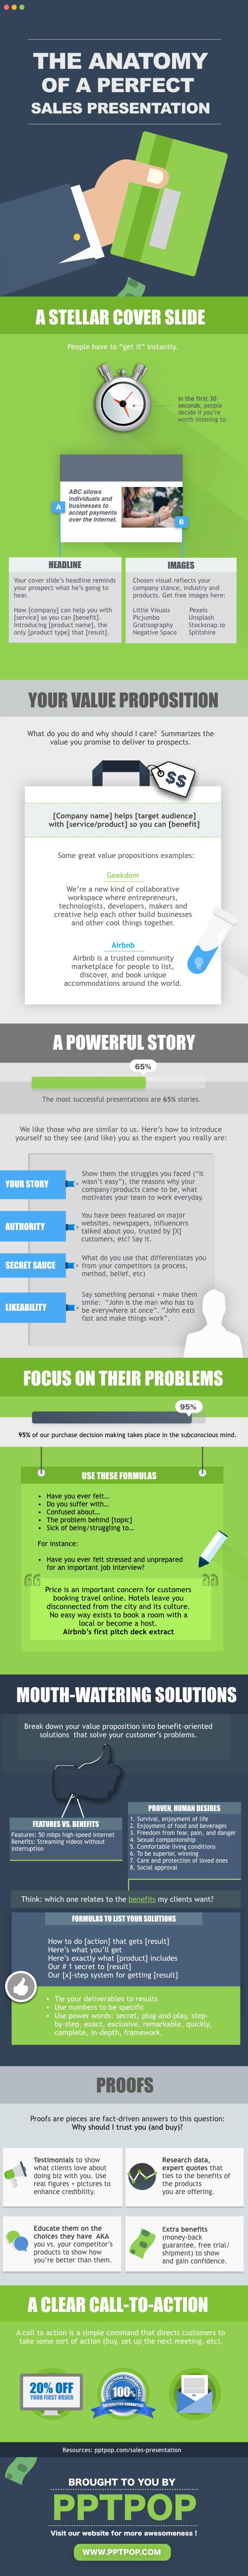 Sales Presentation Infographic